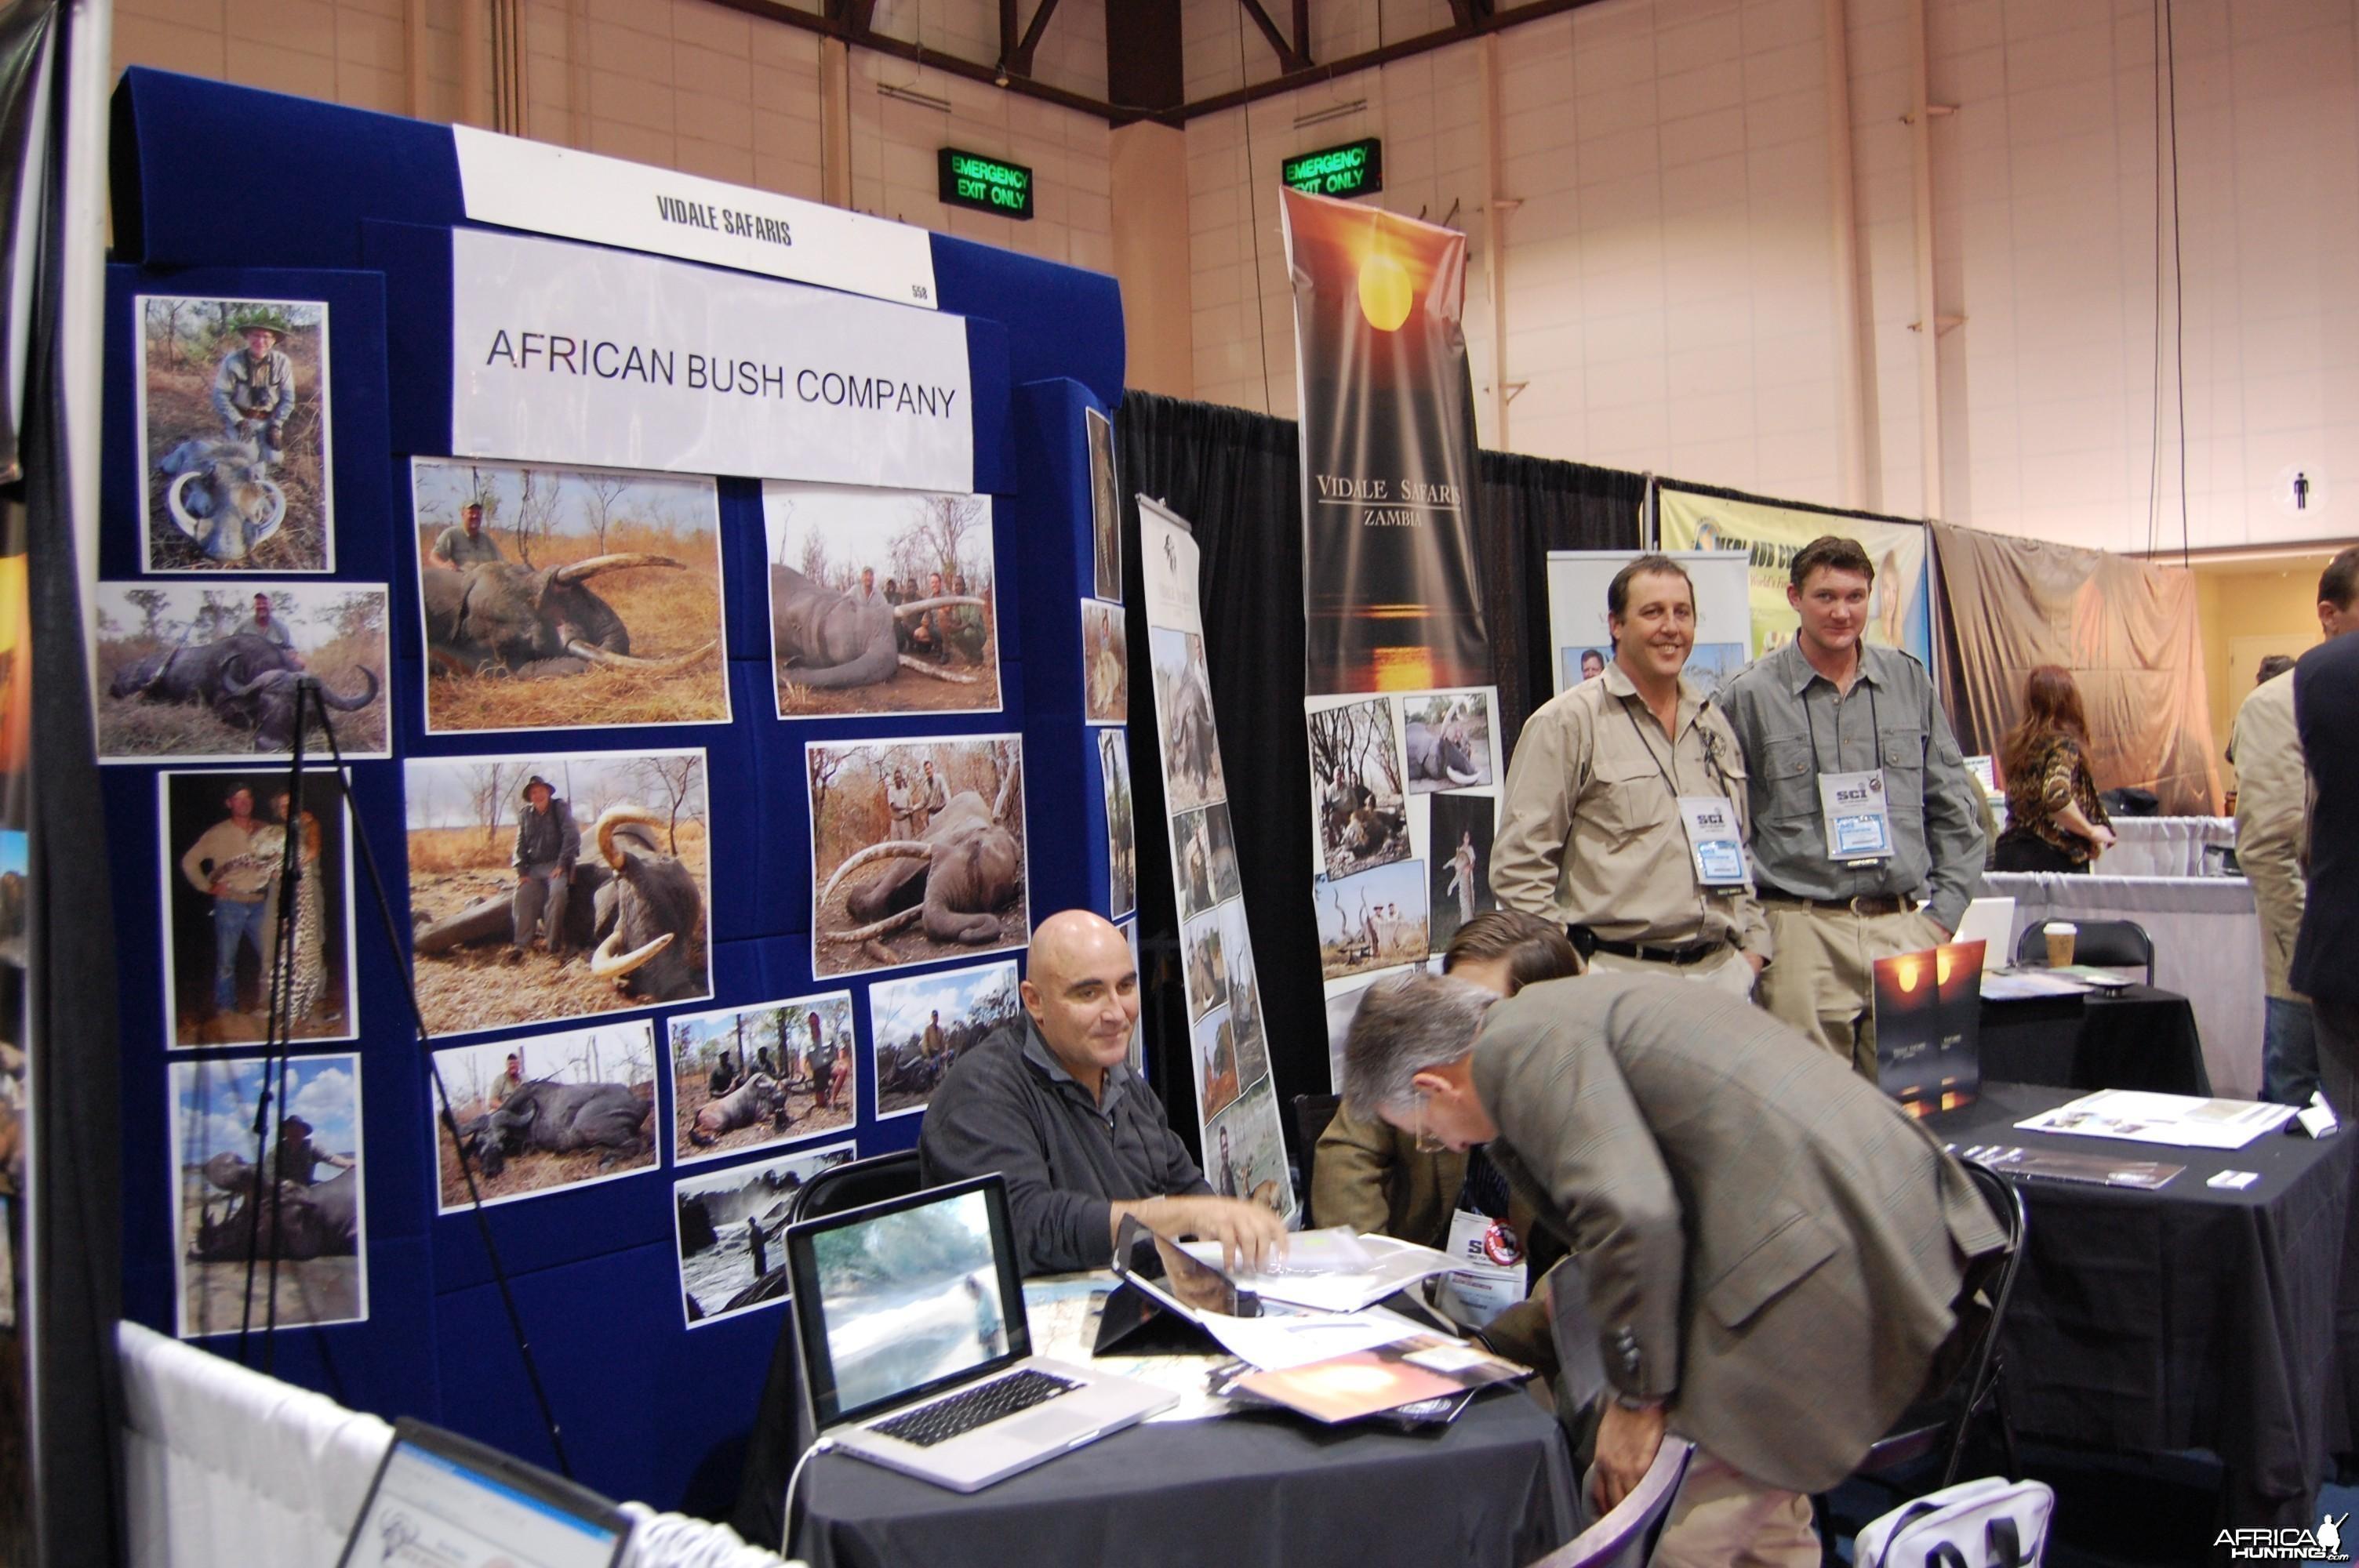 African Bush Company